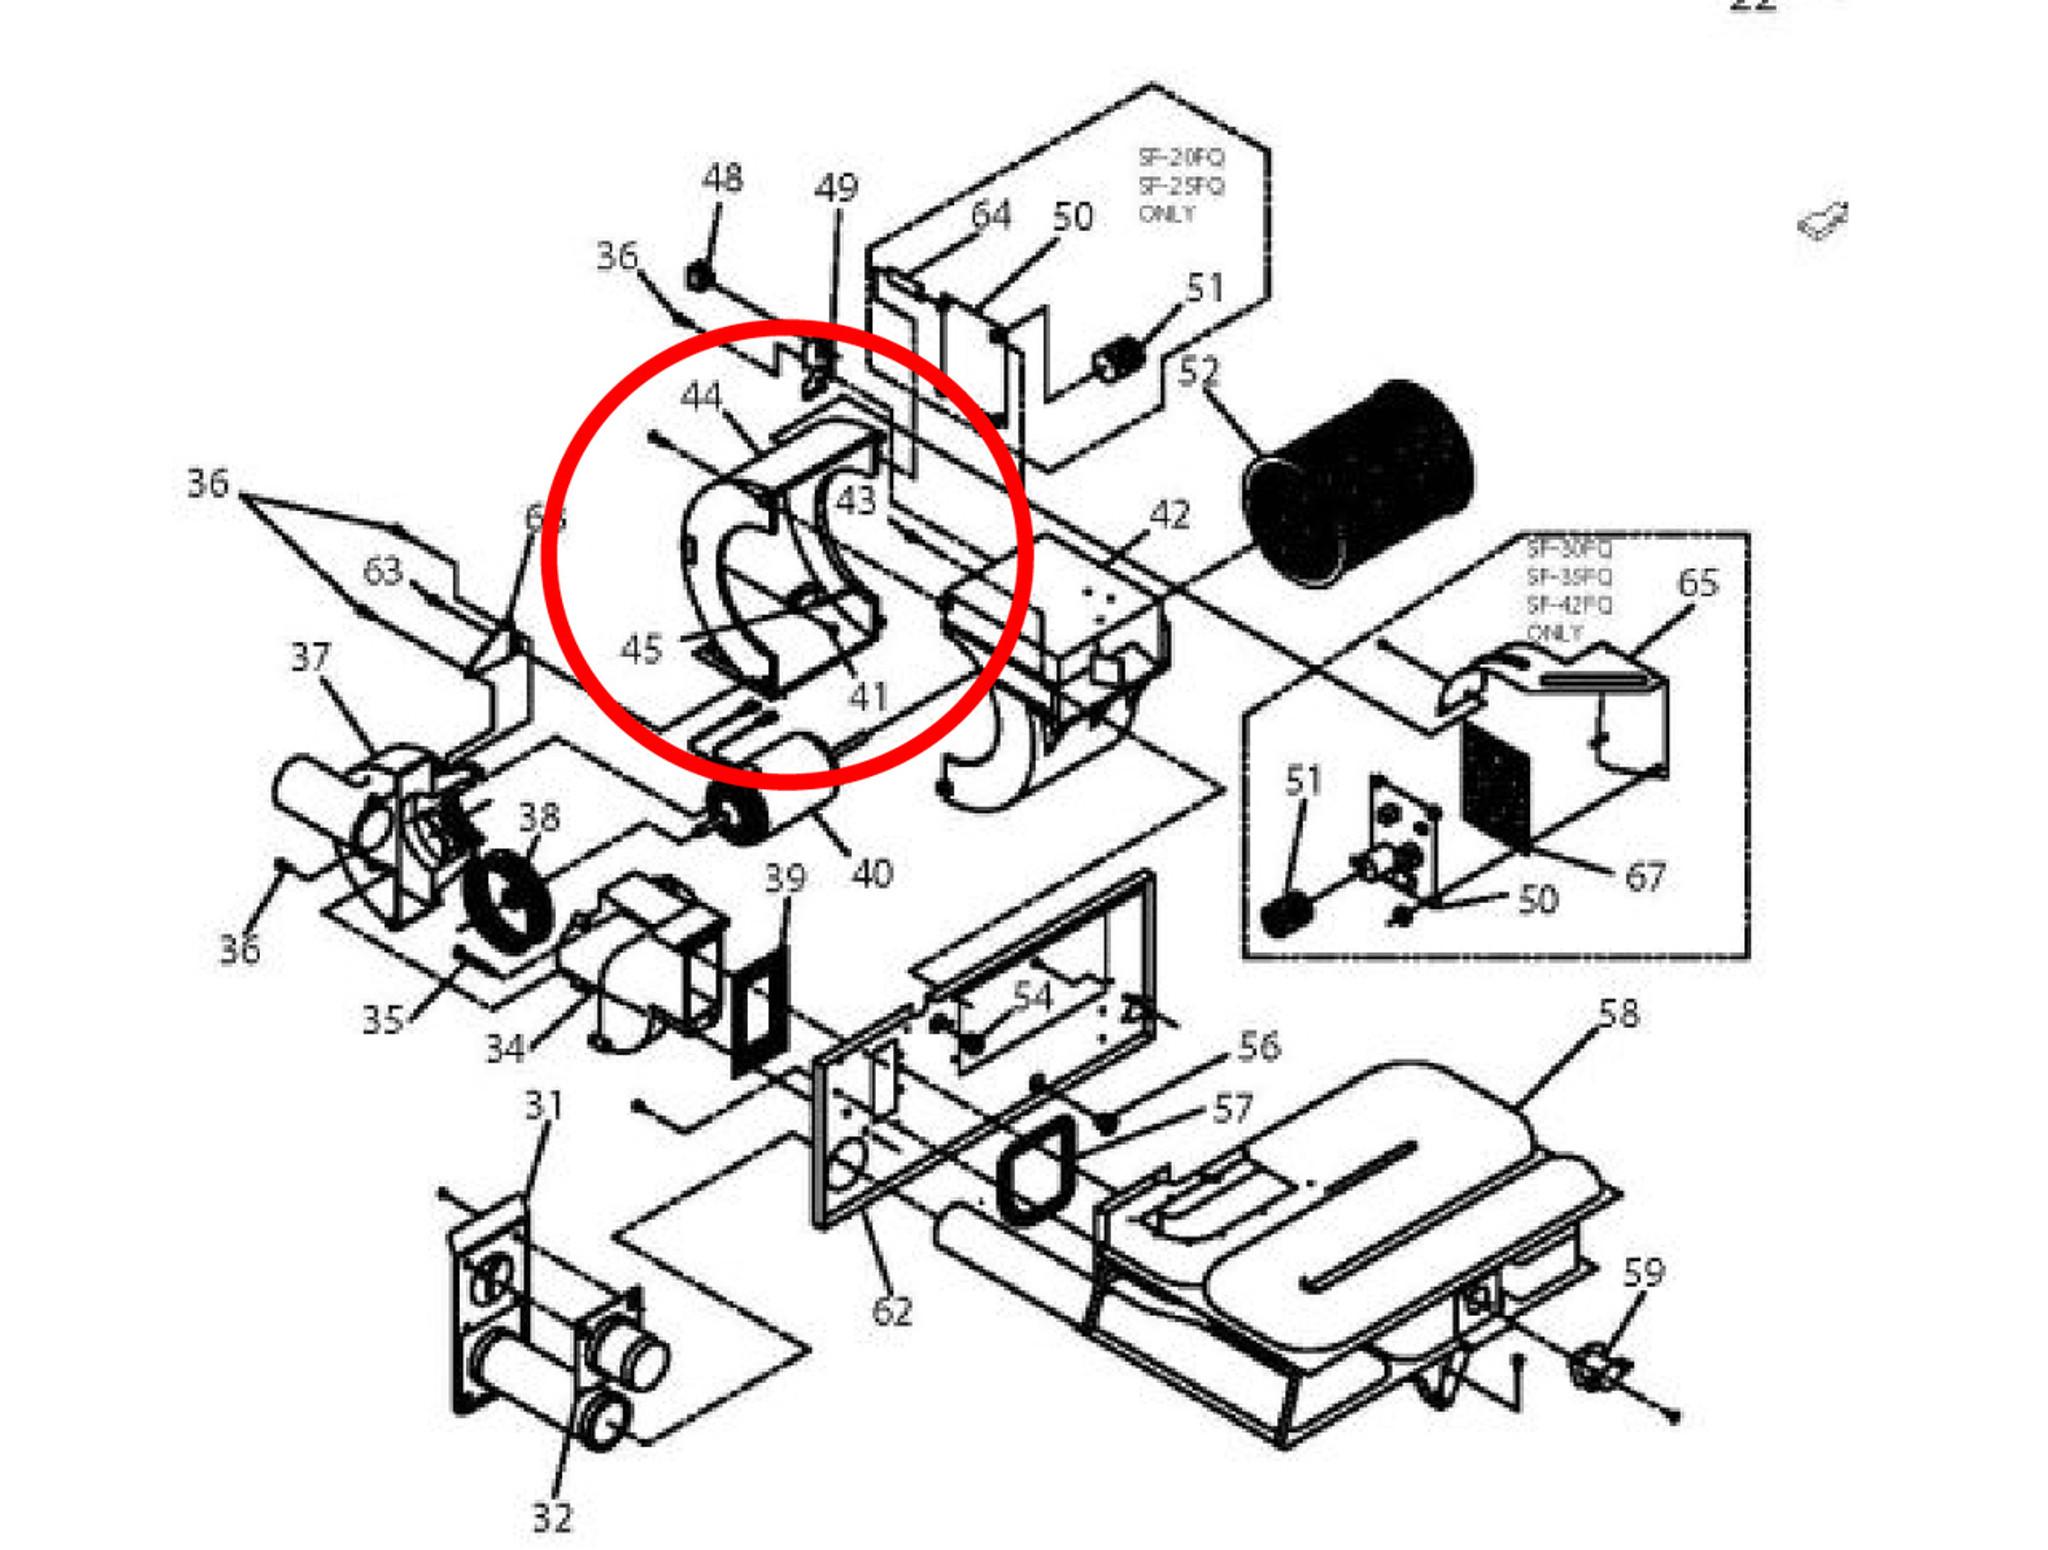 medium resolution of suburban rv furnace sf 42 wiring diagram wiring library gas furnace relay wiring diagram suburban rv furnace sf 42 wiring diagram